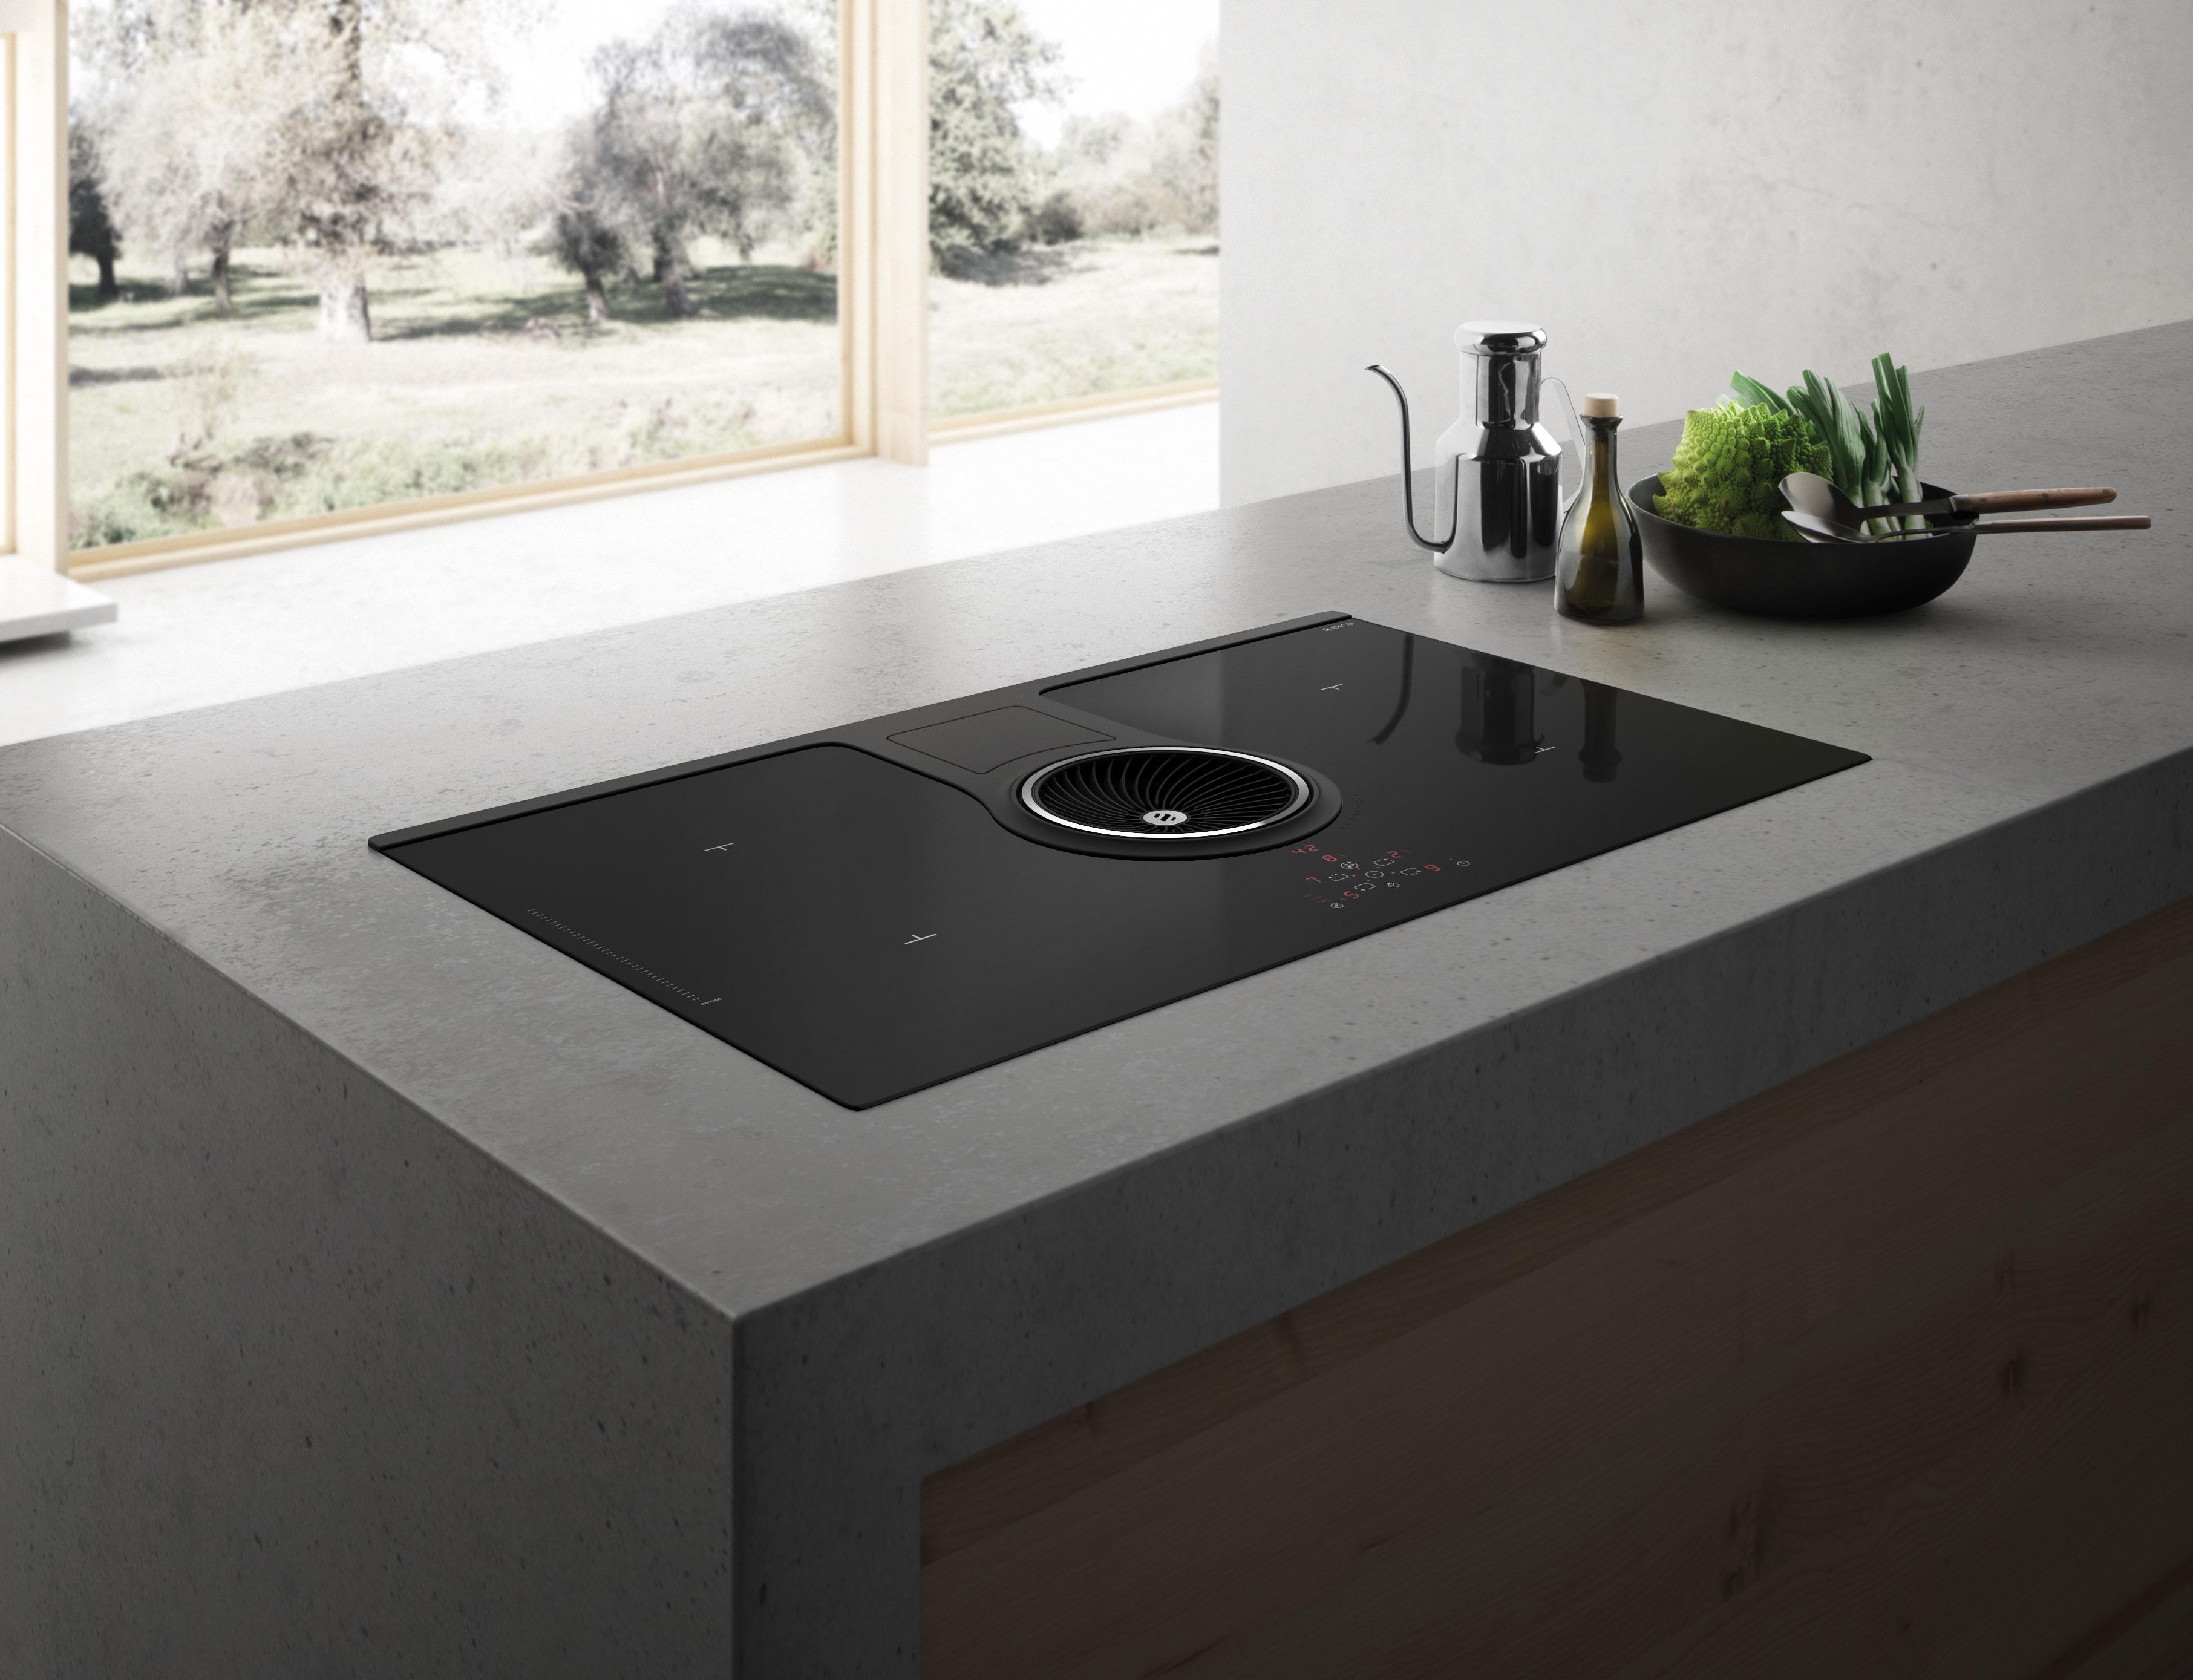 elica wins three good design awards home appliances world